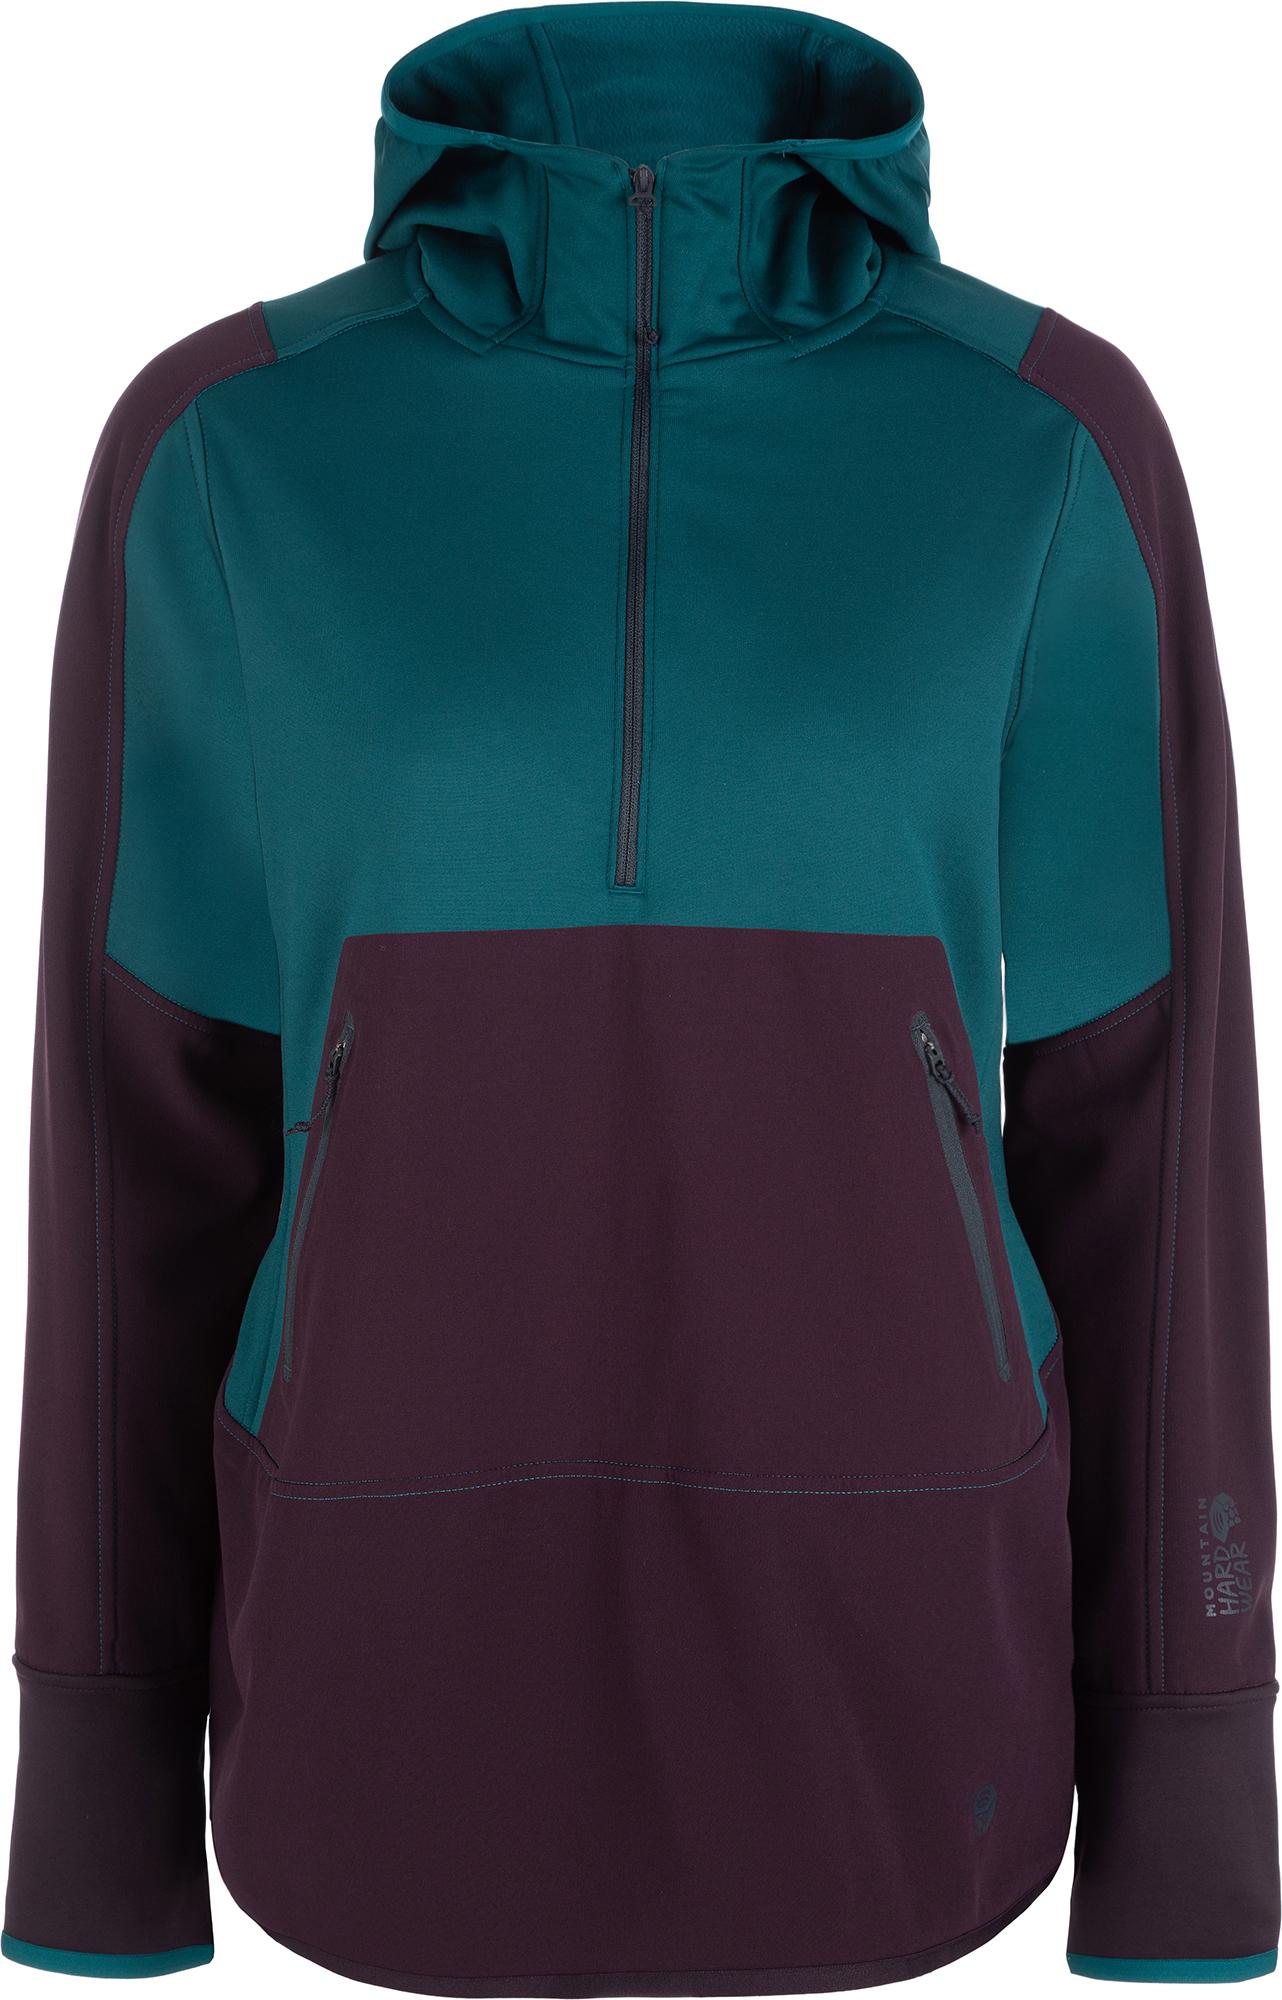 Фото - Mountain Hardwear Джемпер флисовый женский Mountain Hardwear Frostzone™, размер 46 джемпер женский zarina цвет белый 8224547442001 размер m 46